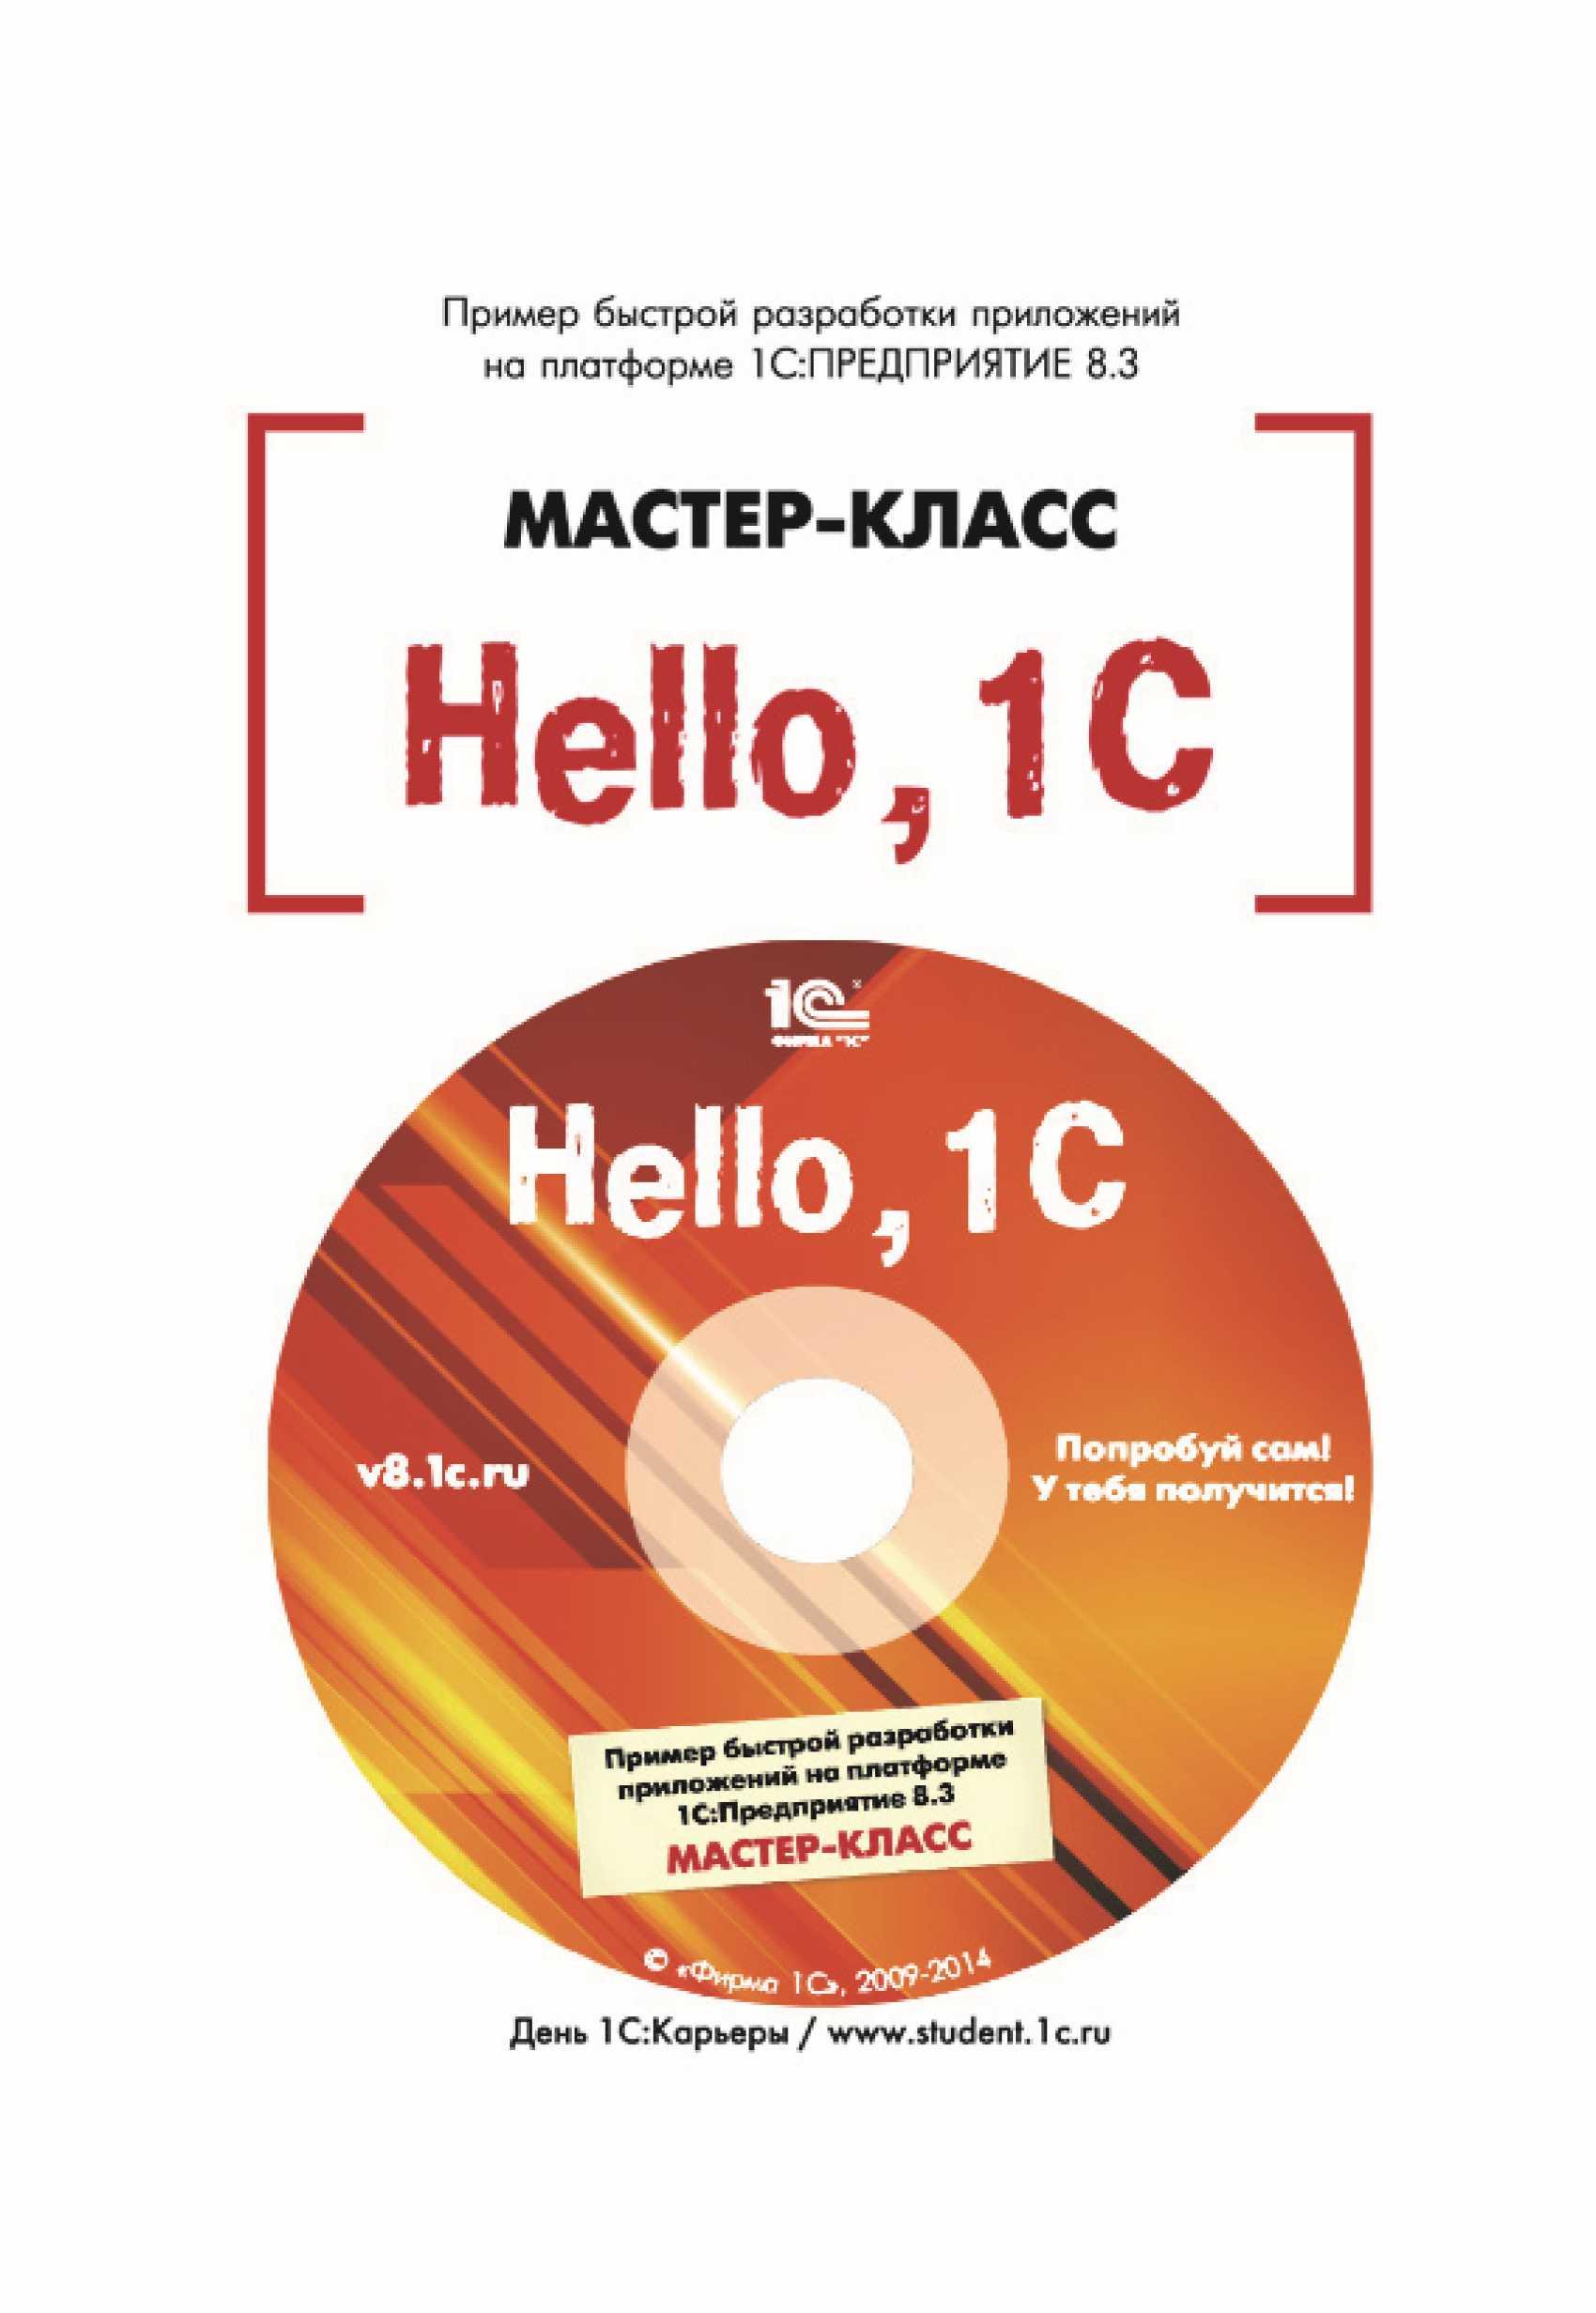 В. В. Рыбалка Hello, 1C. Пример быстрой разработки приложений на 1С:Предприятие 8.3. Версия 3 (+ epub)